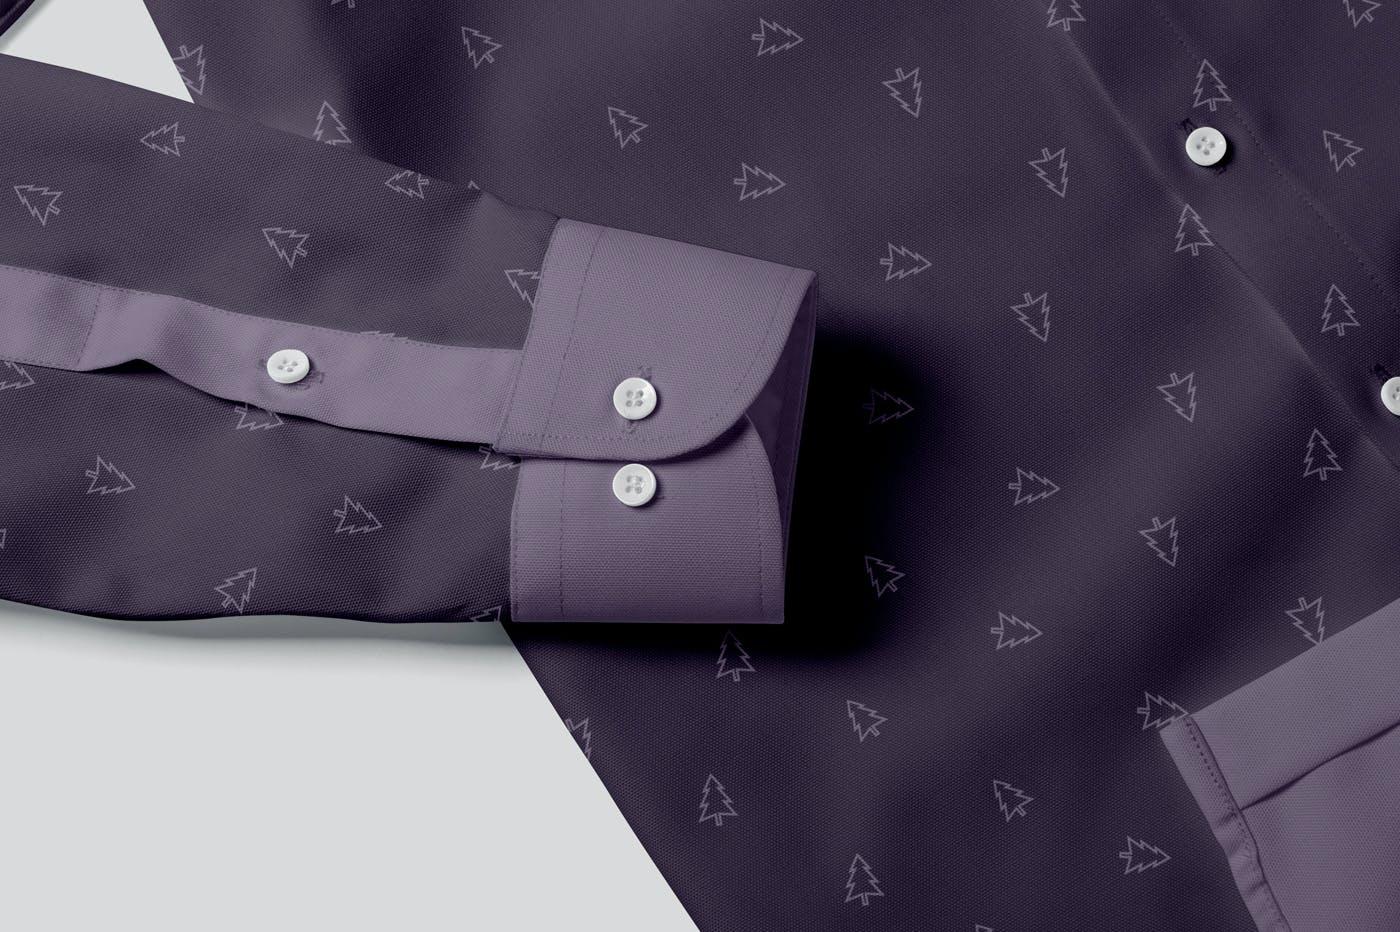 男士纽扣衬衫印花设计PS贴图样机模板 Button Up Shirt For Men Mockups插图6